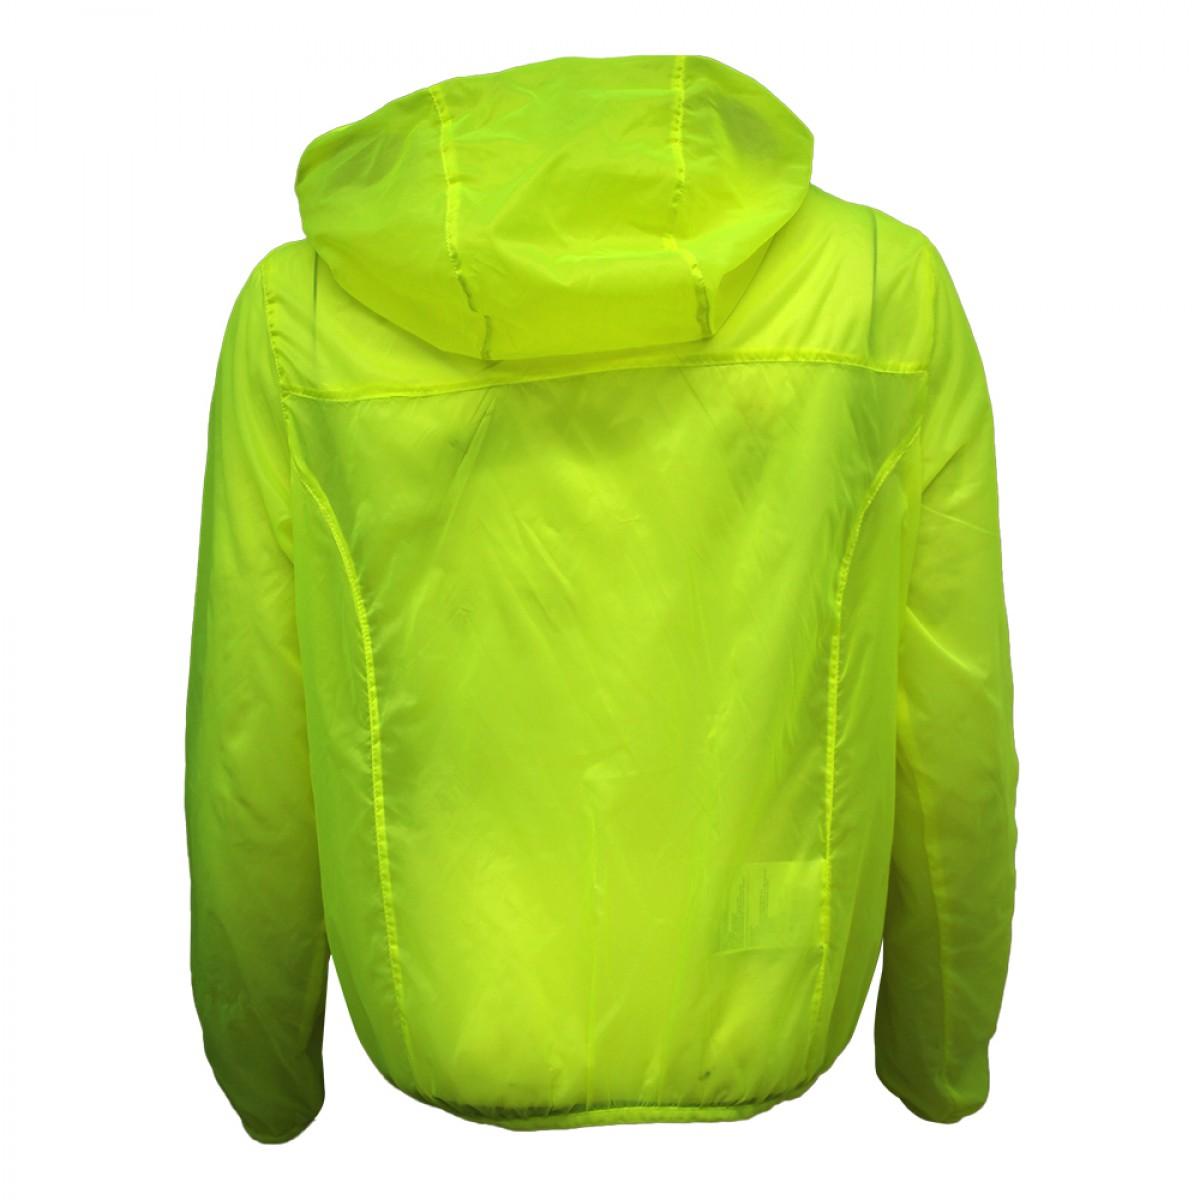 8848-ktm-cty-women-transparent-windcheater-jacket-w2kw2j96739-1a